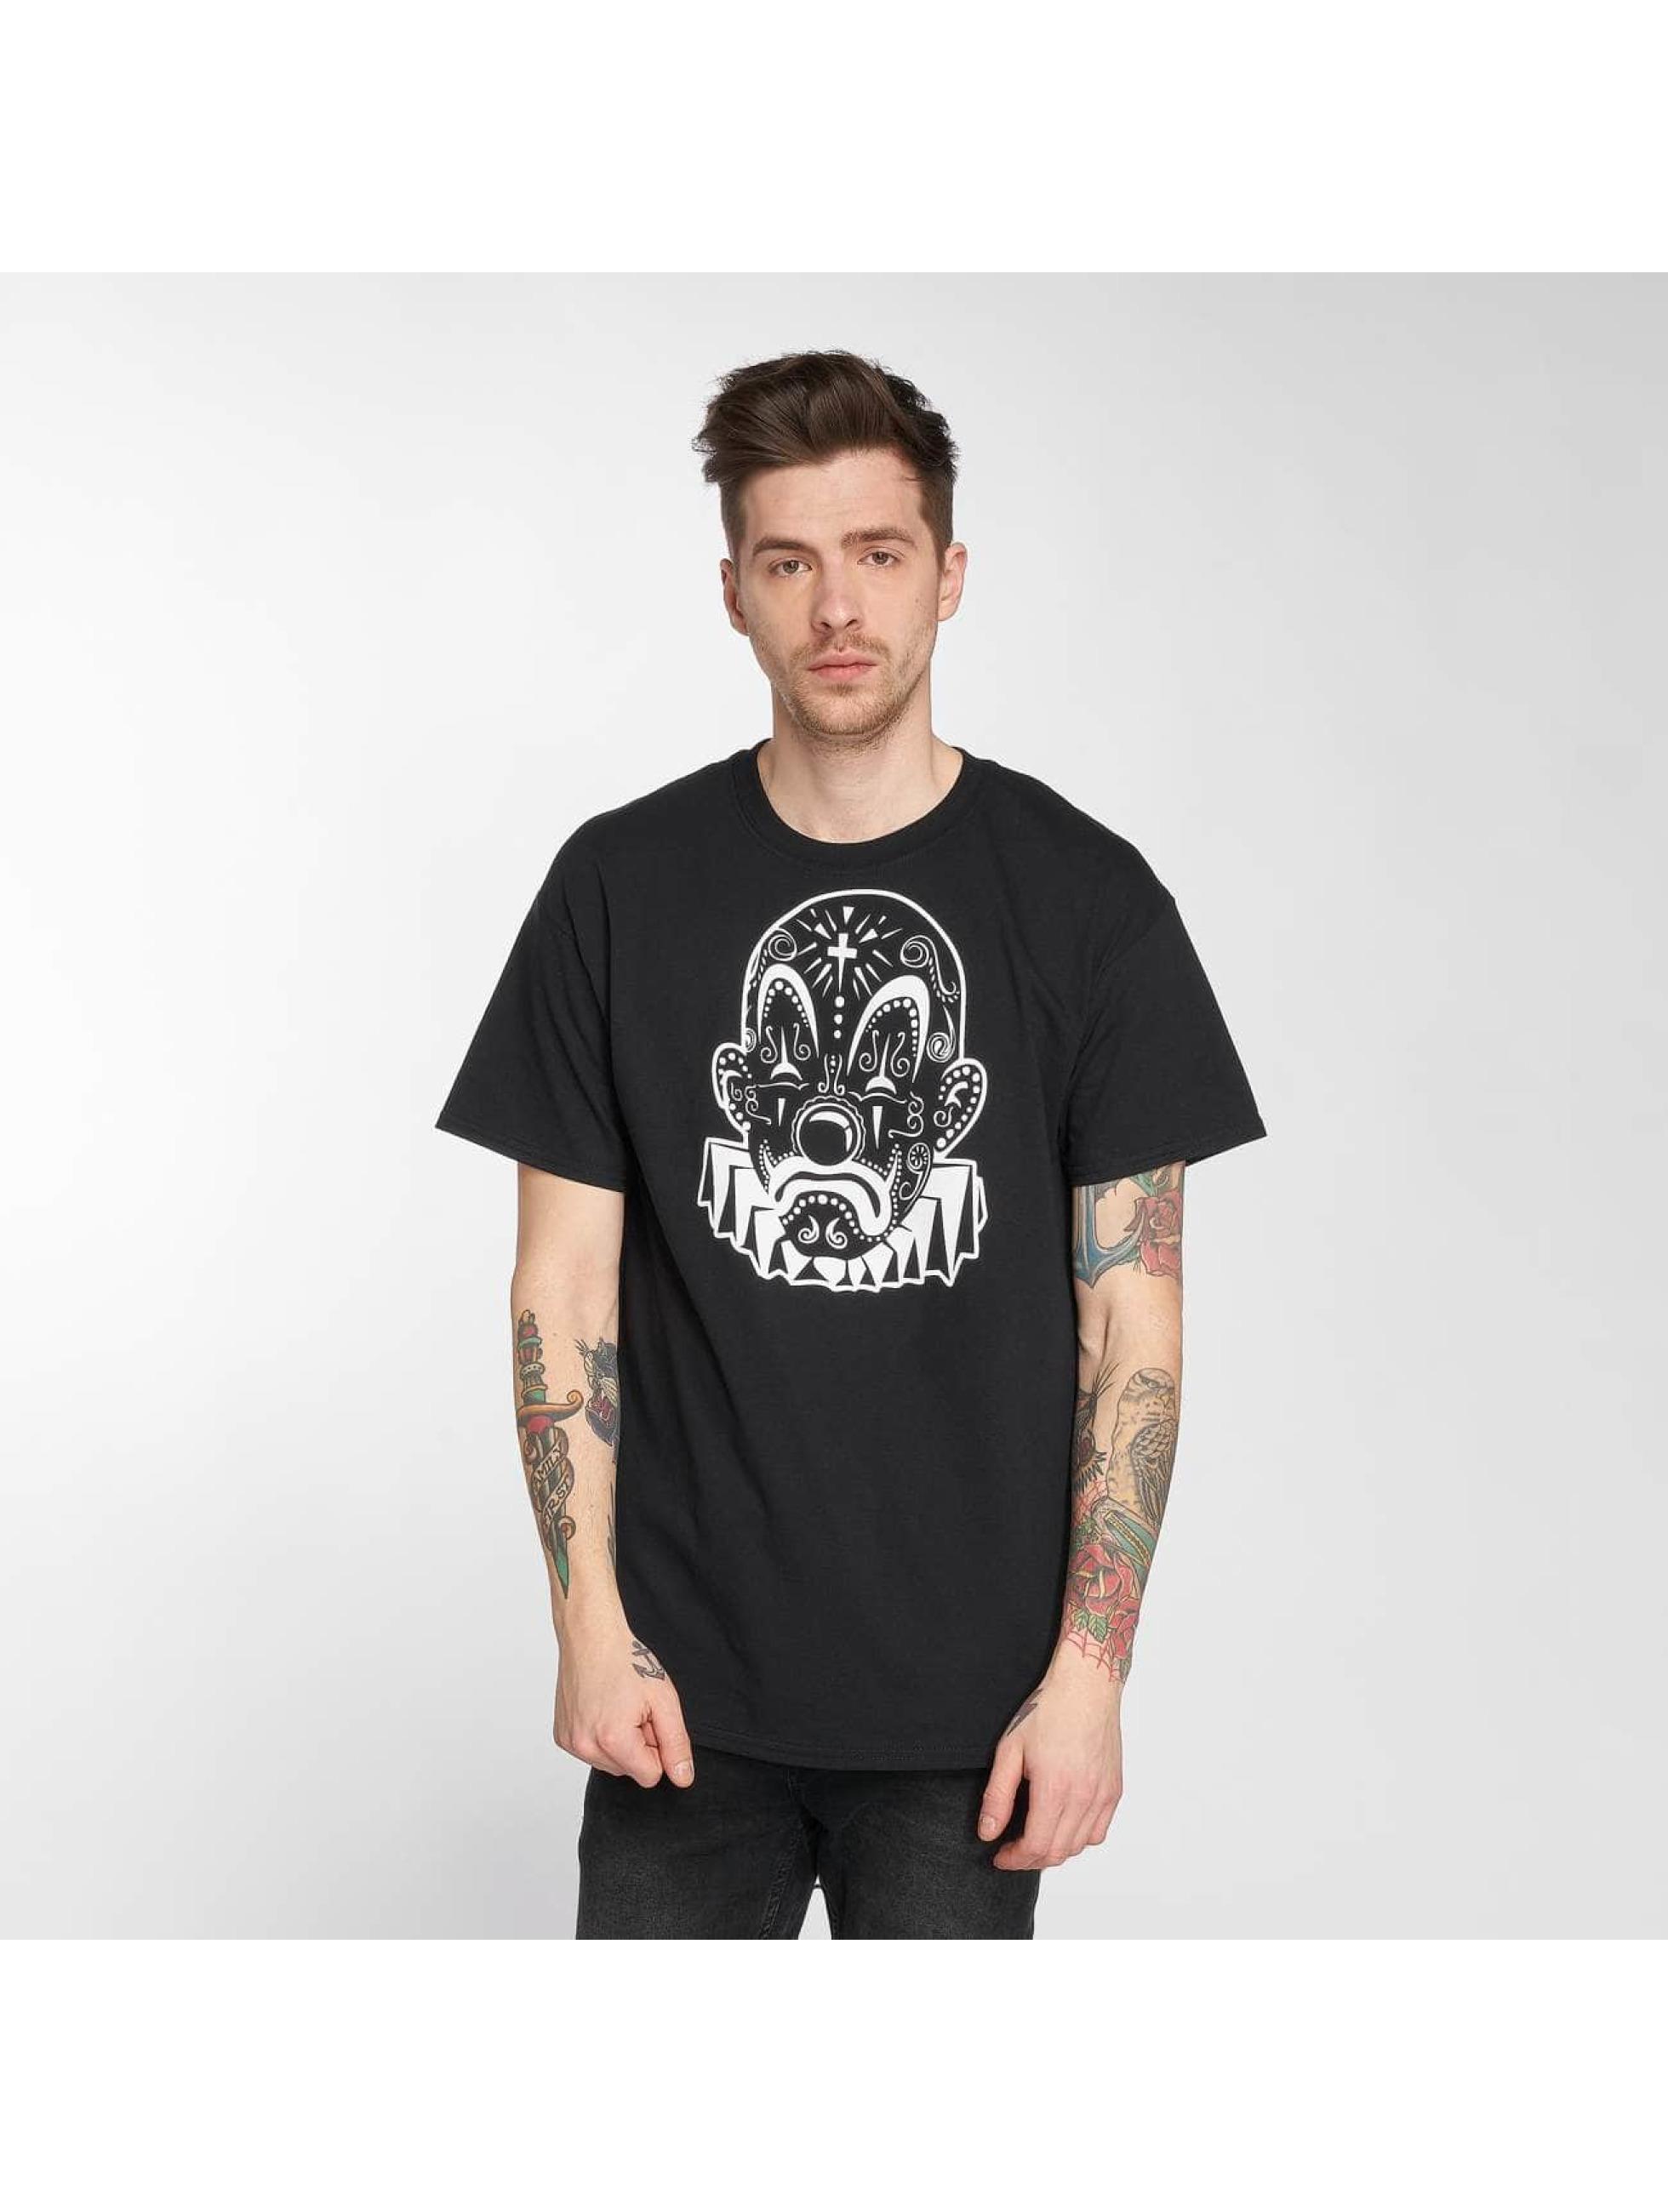 Joker T-Shirt Mexico Clown black